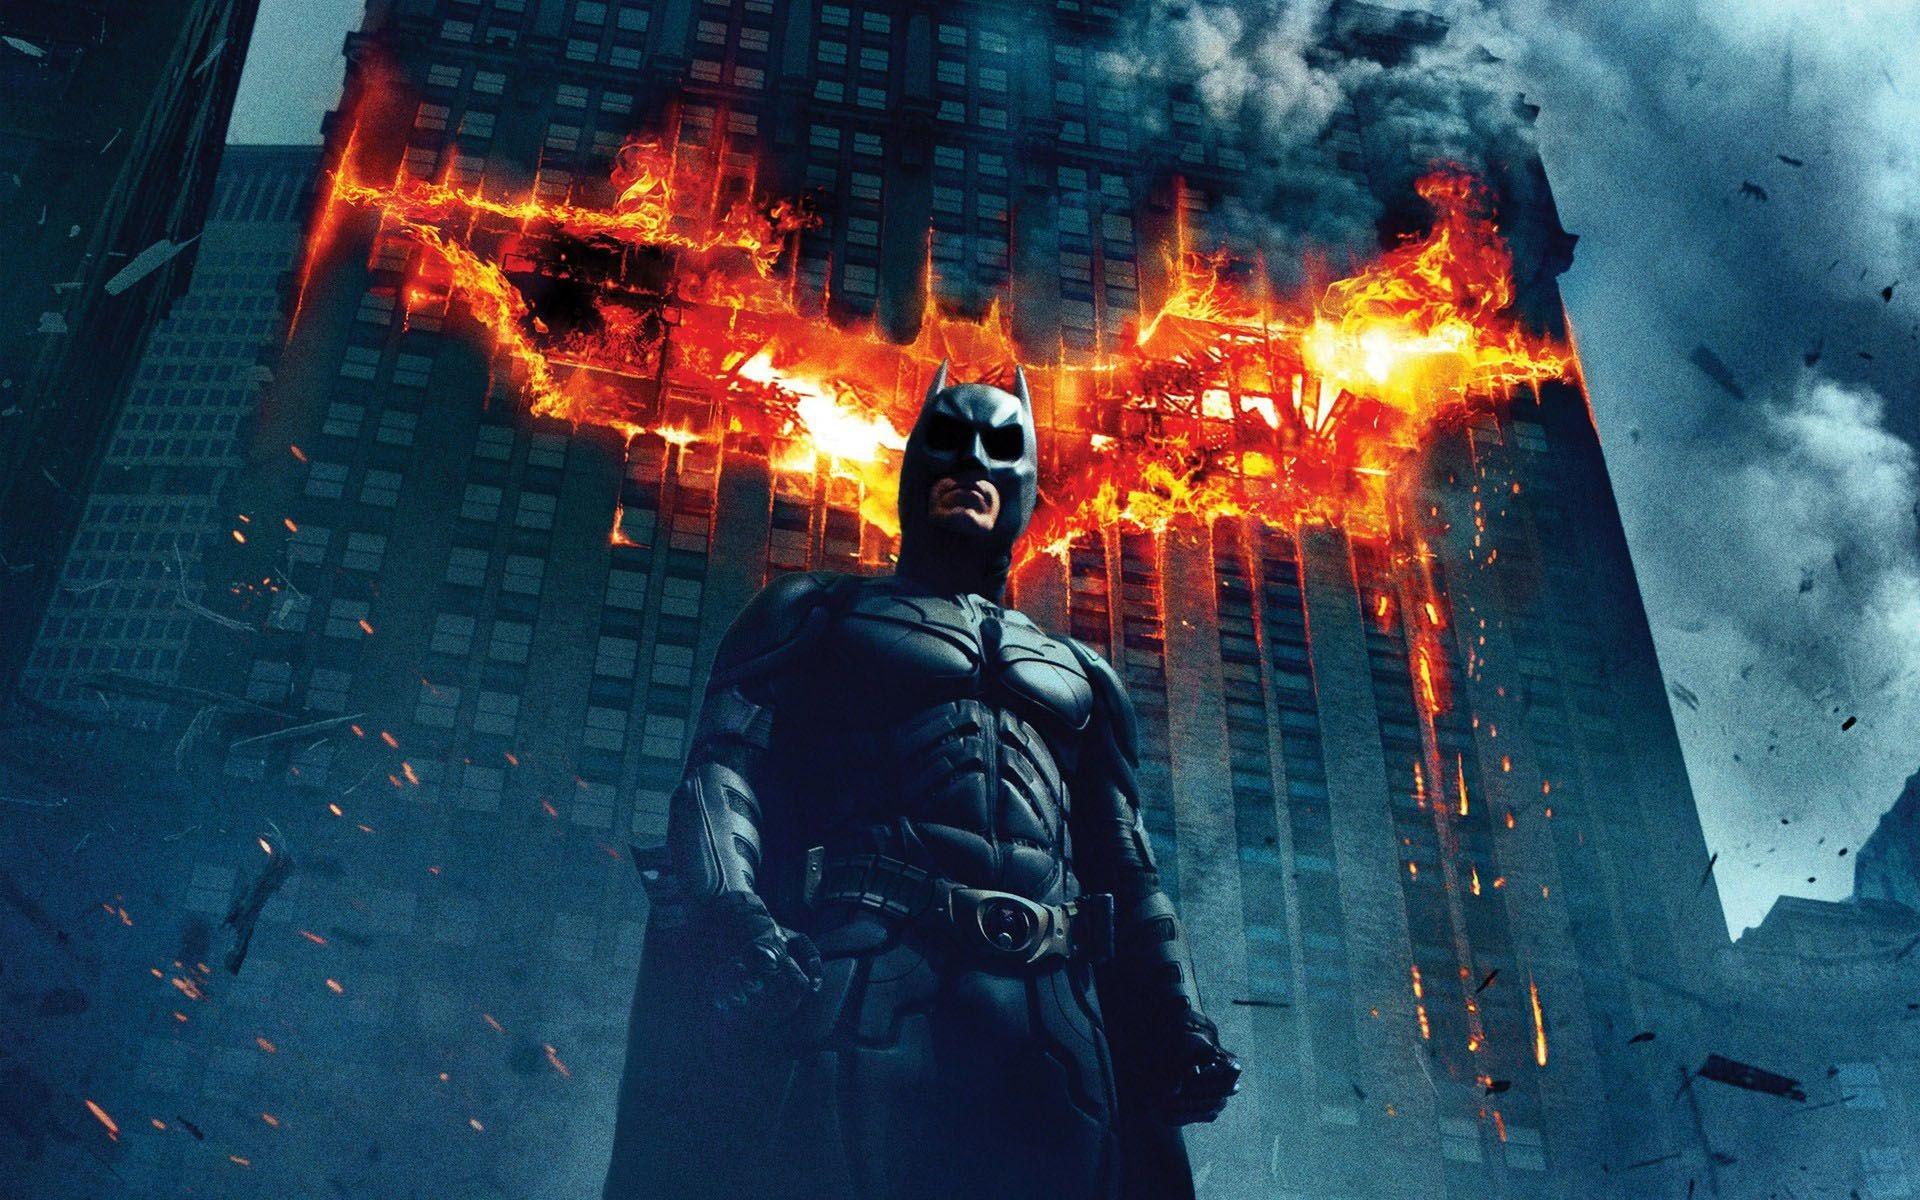 Download Batman The Dark Knight Wallpaper High Definition #wadnd .